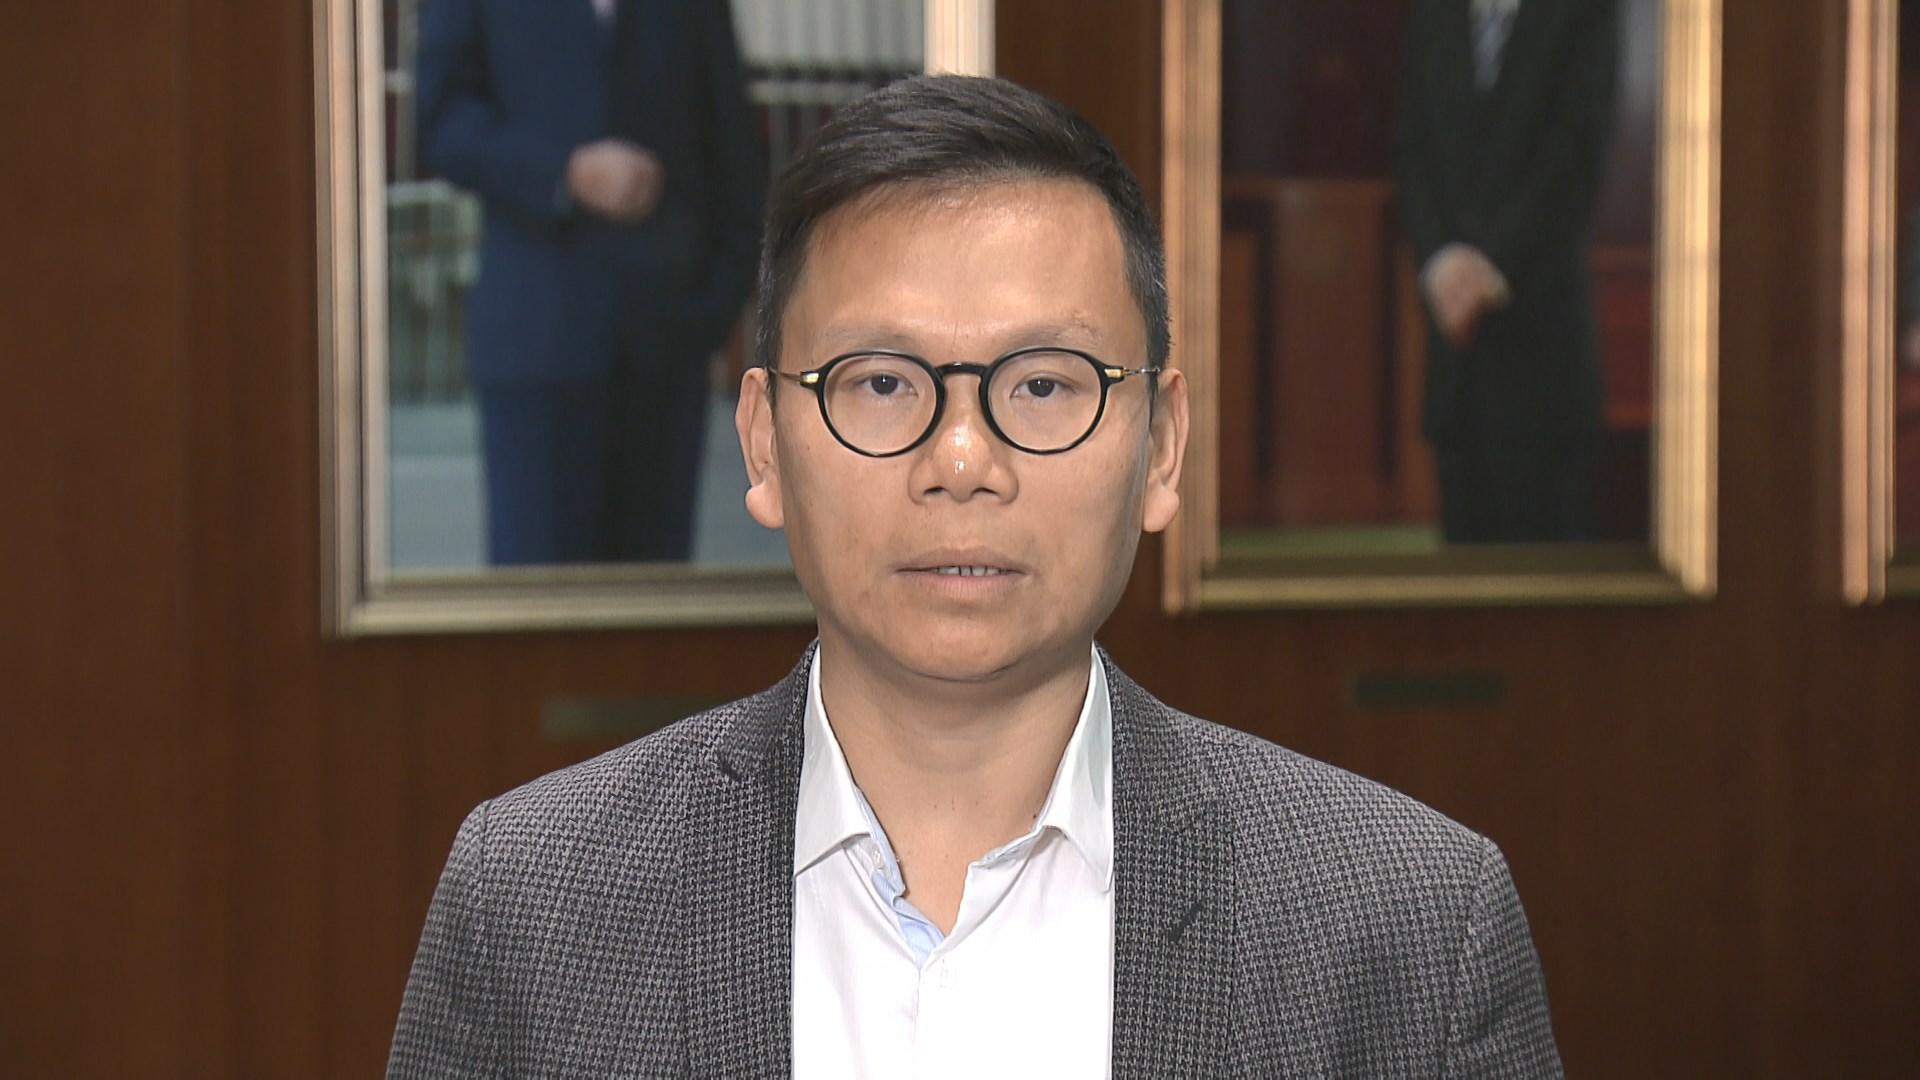 陳恒鑌:應評估翻新工程會否影響病人安全